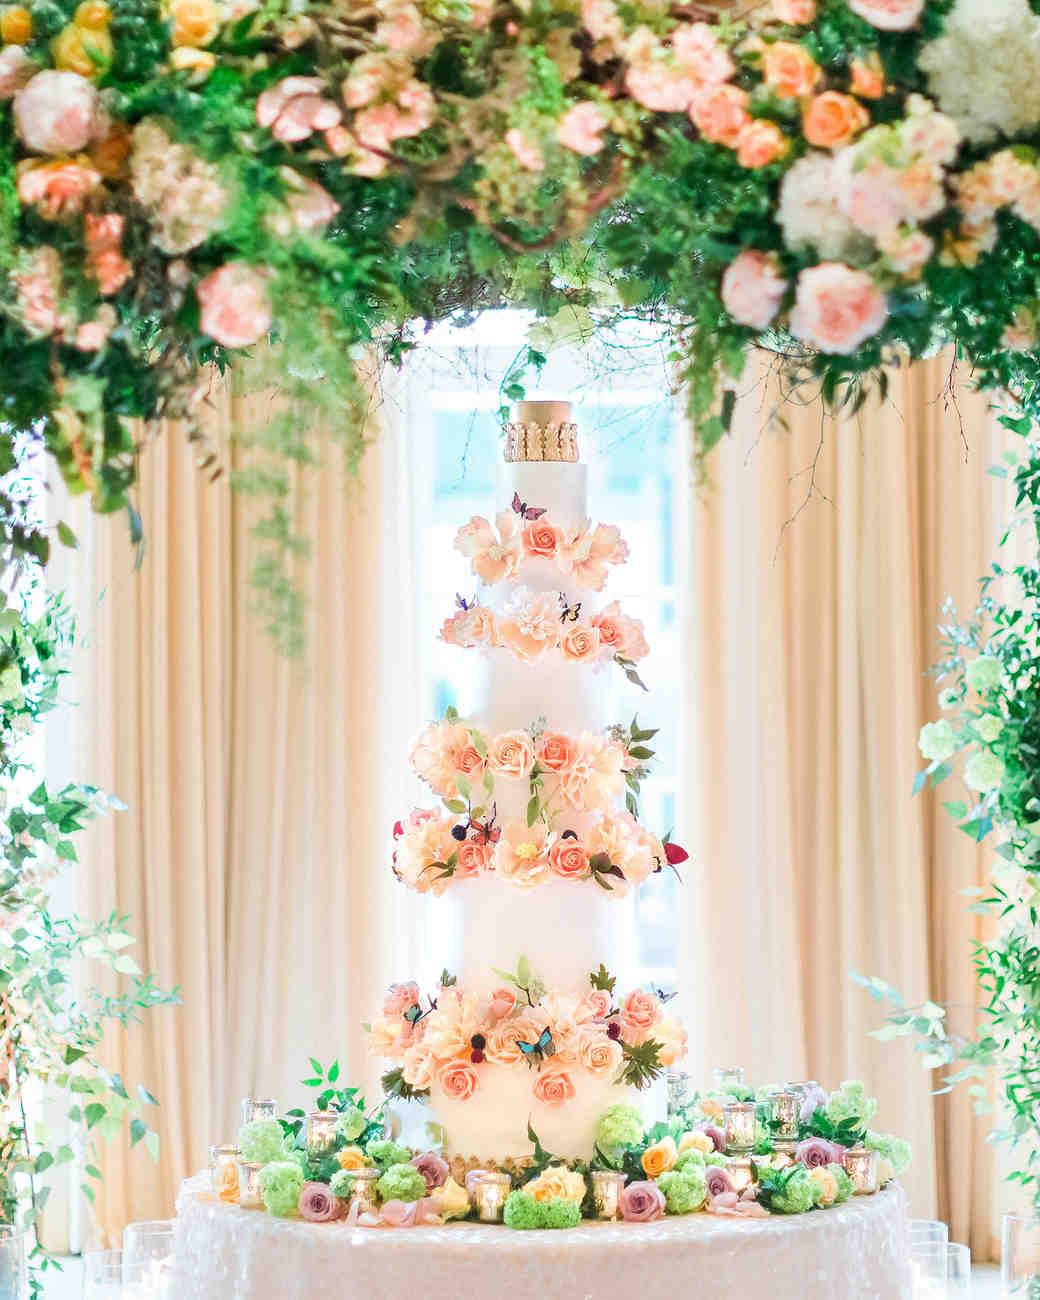 glamorous wedding ideas tall confection cake